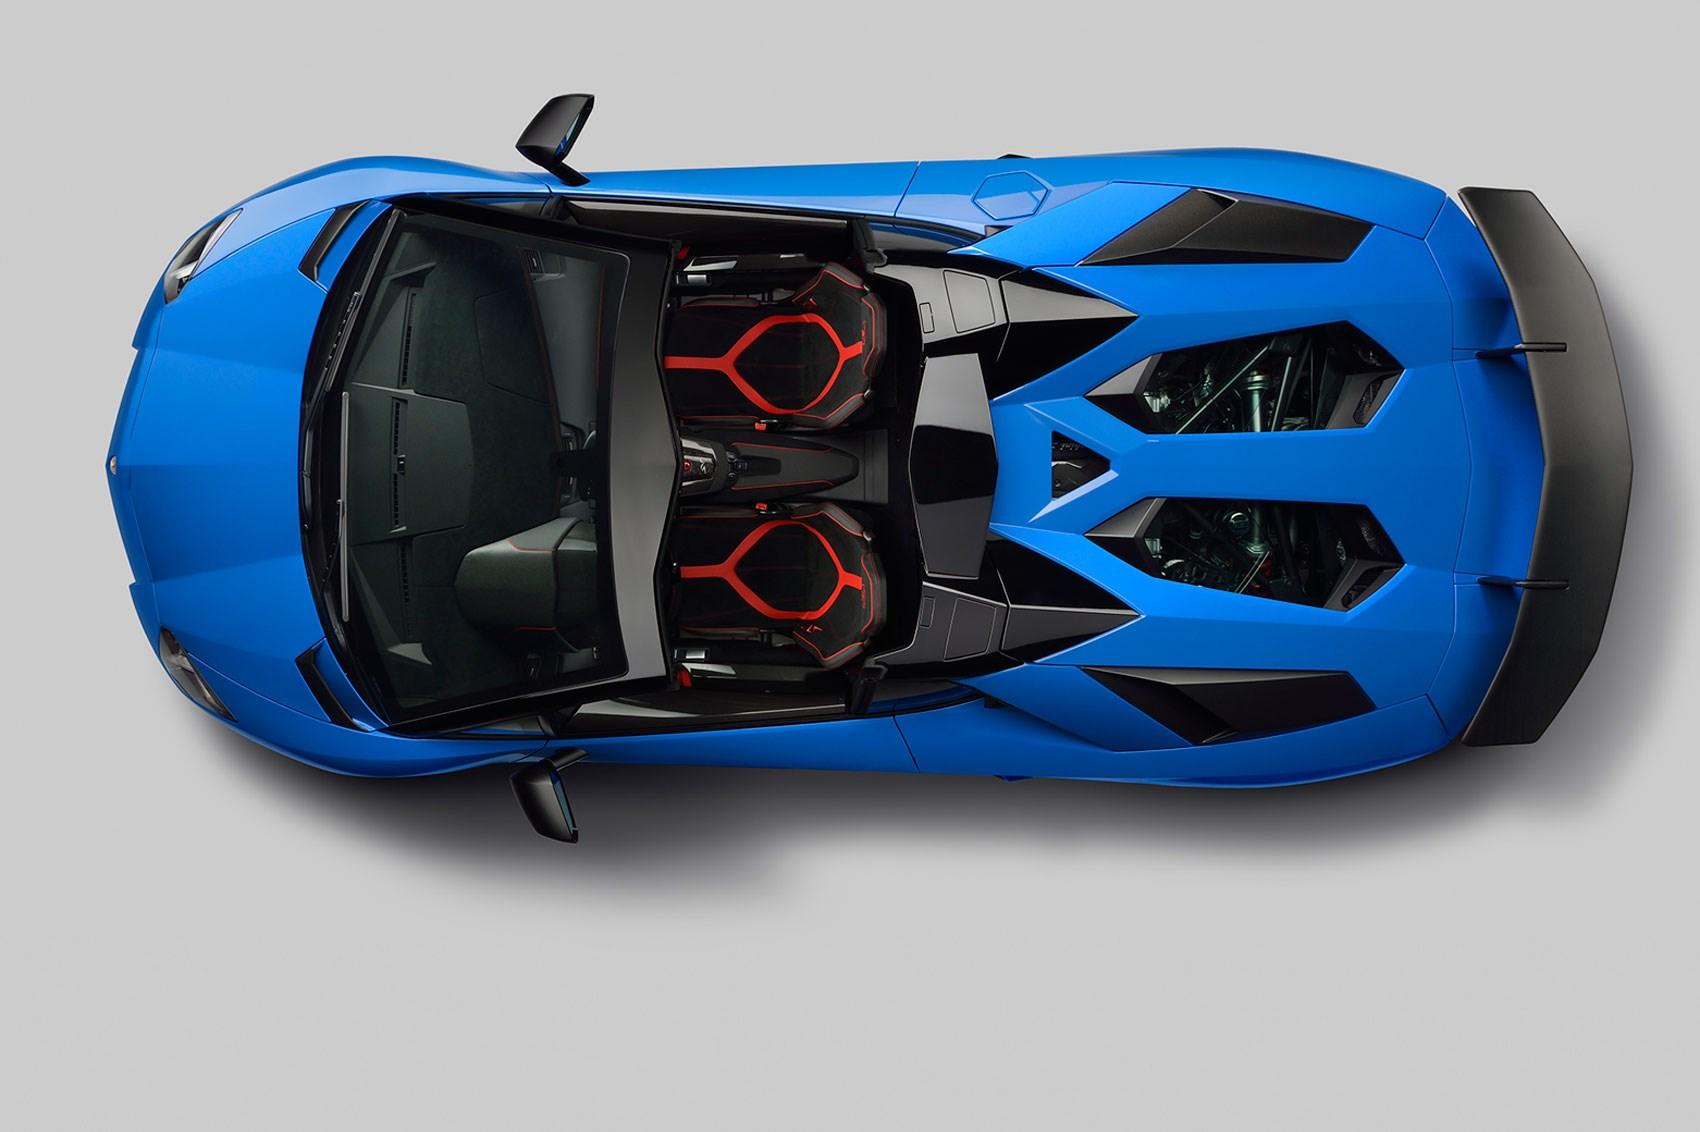 lamborghini aventador super veloce roadster 2016 the sv blows its top by car magazine. Black Bedroom Furniture Sets. Home Design Ideas